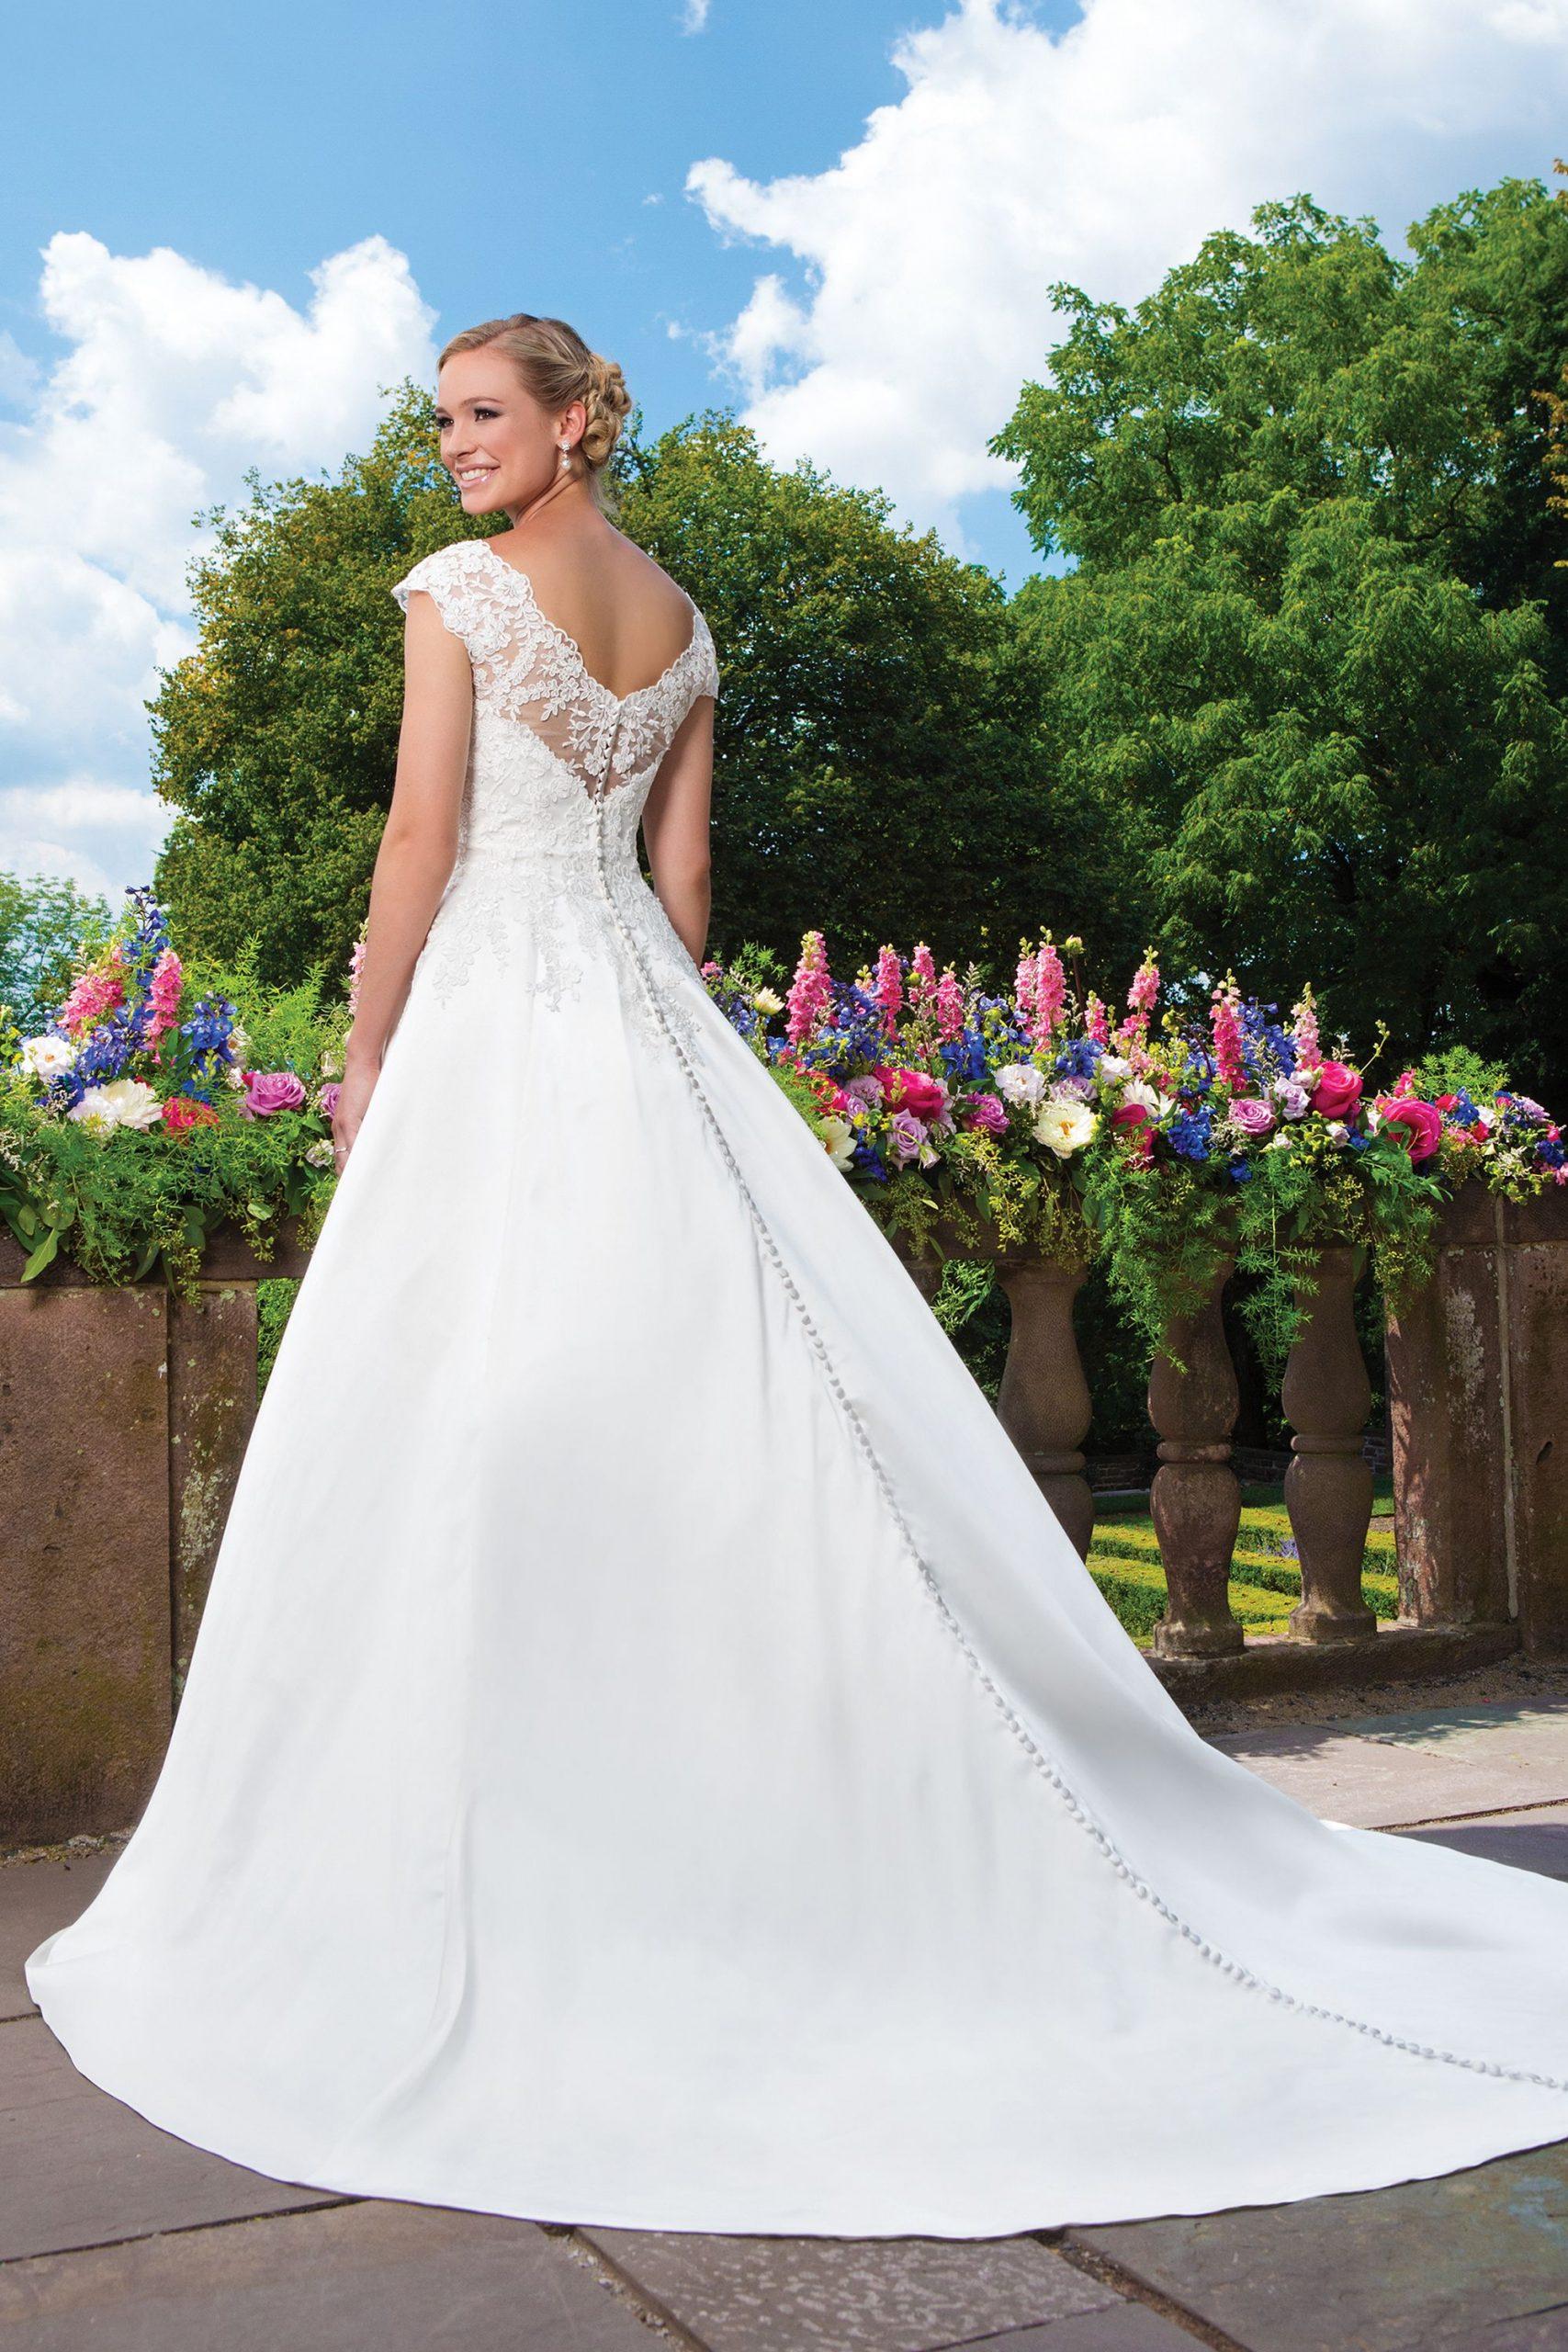 Vestuviniu sukneliu salonas